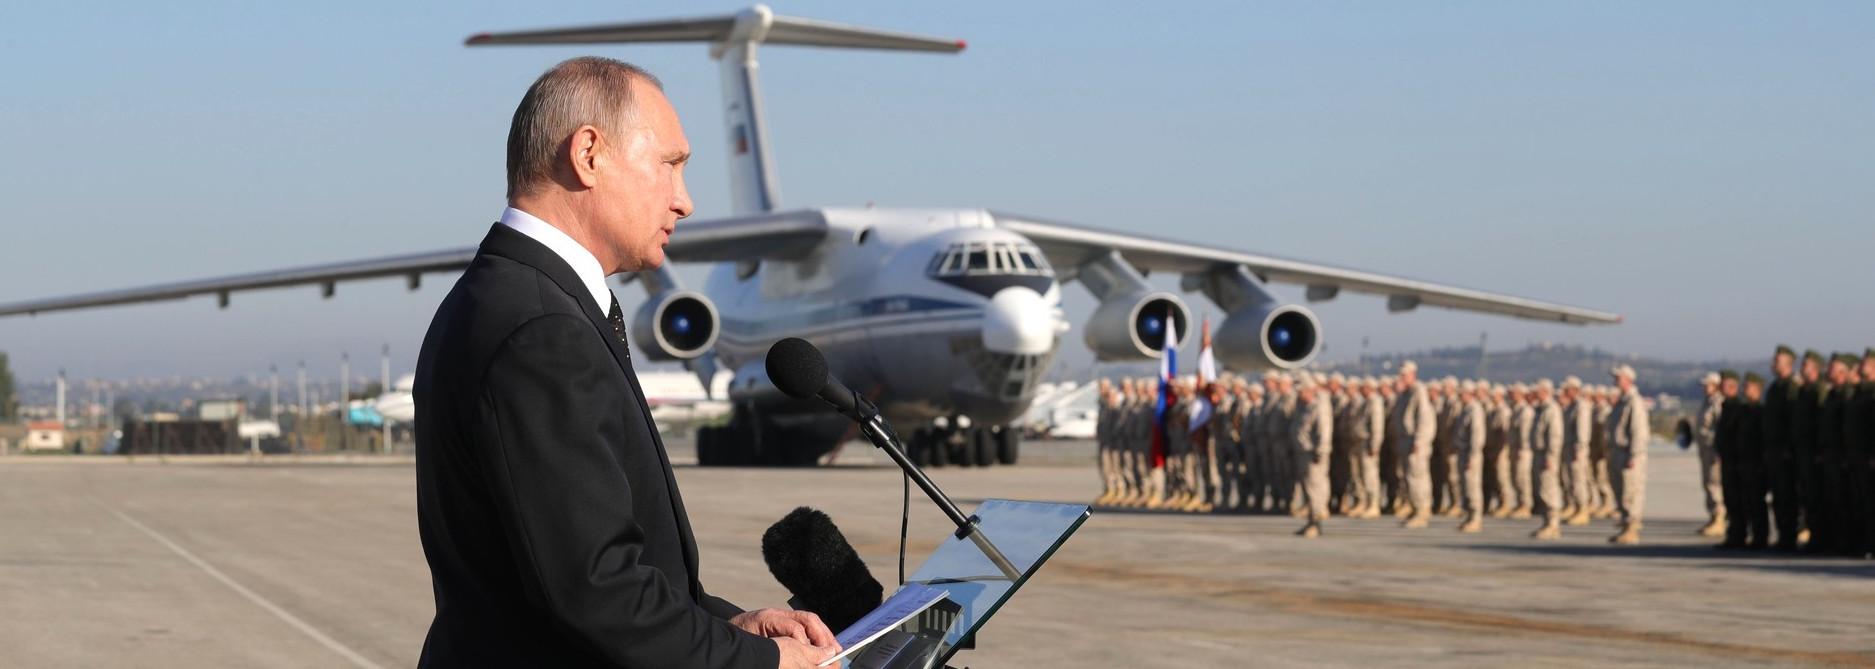 Russia's Vladimir Putin at Khmeimim air base in Syria on Monday (Photo: Kremlin.ru)